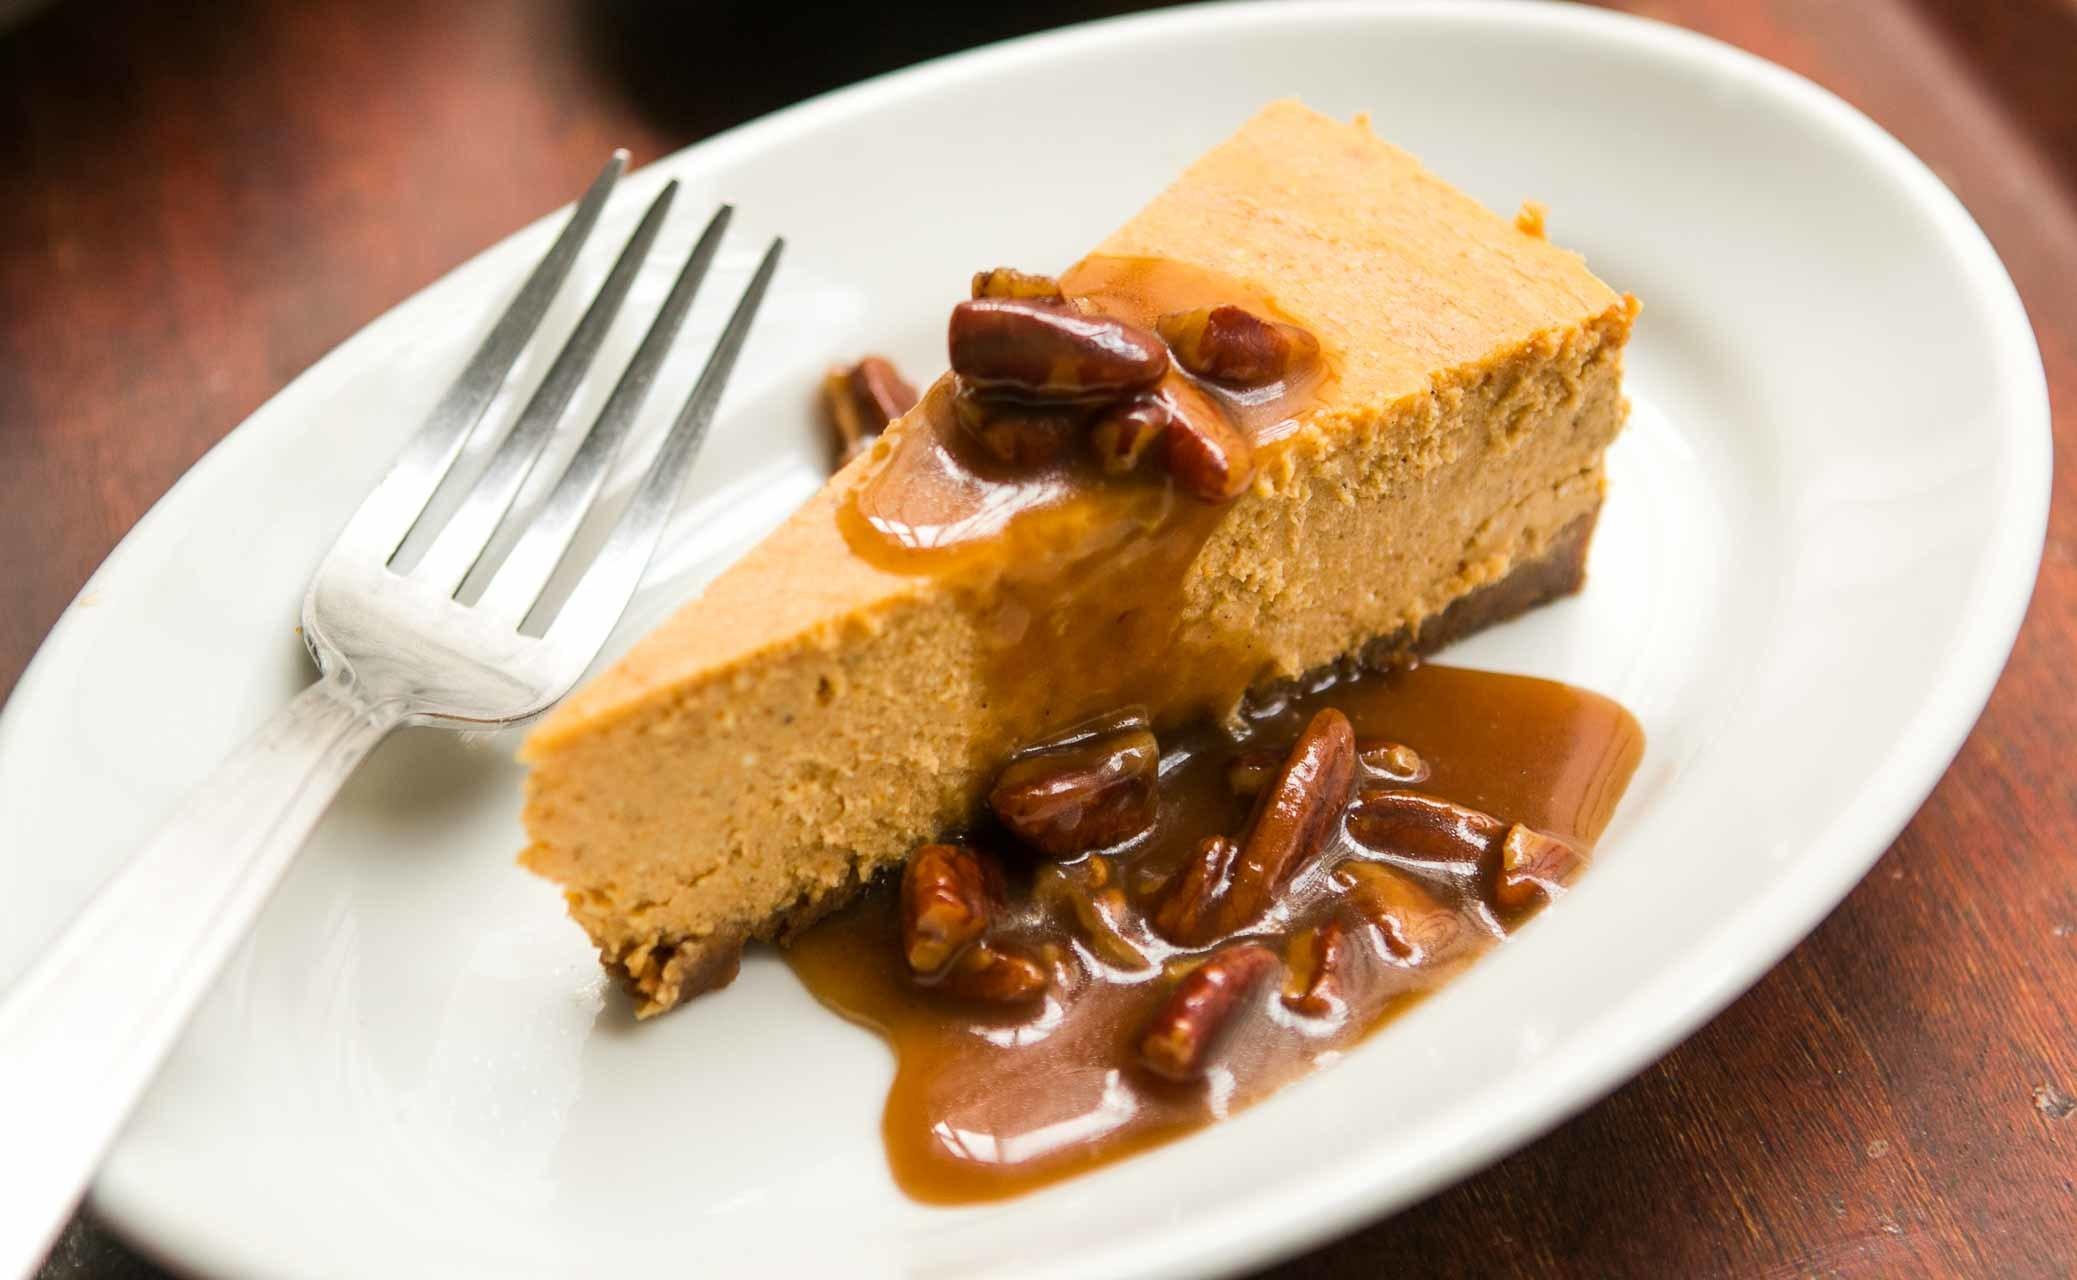 Pumpkin Cheesecake with Pecan Praline Sauce